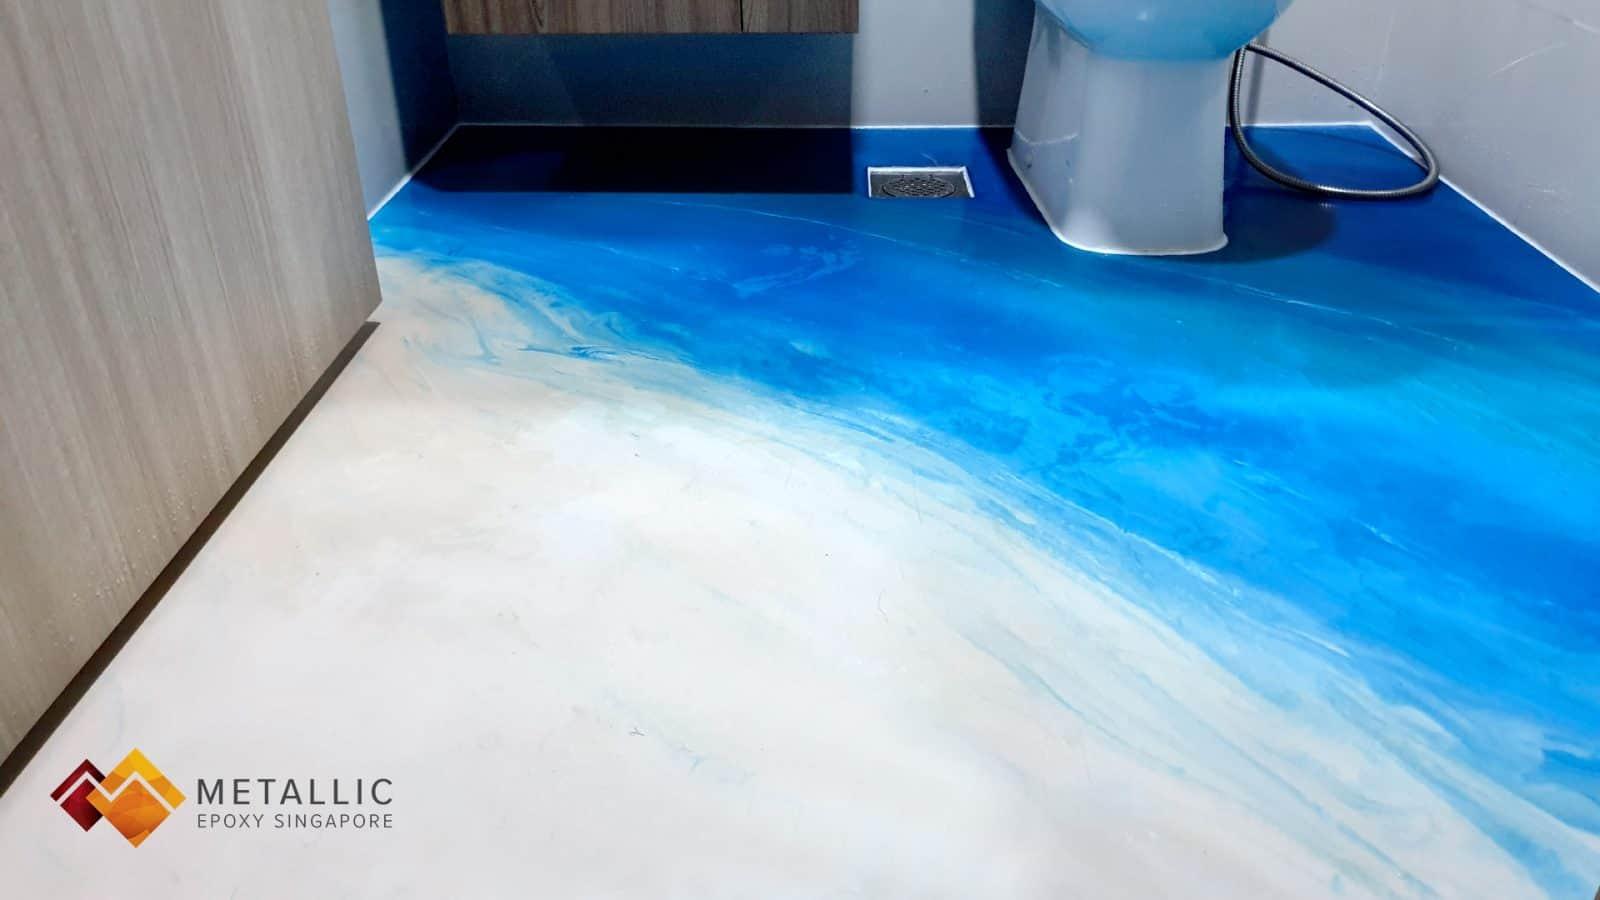 metallic epoxy singapore beach theme bathroom floor